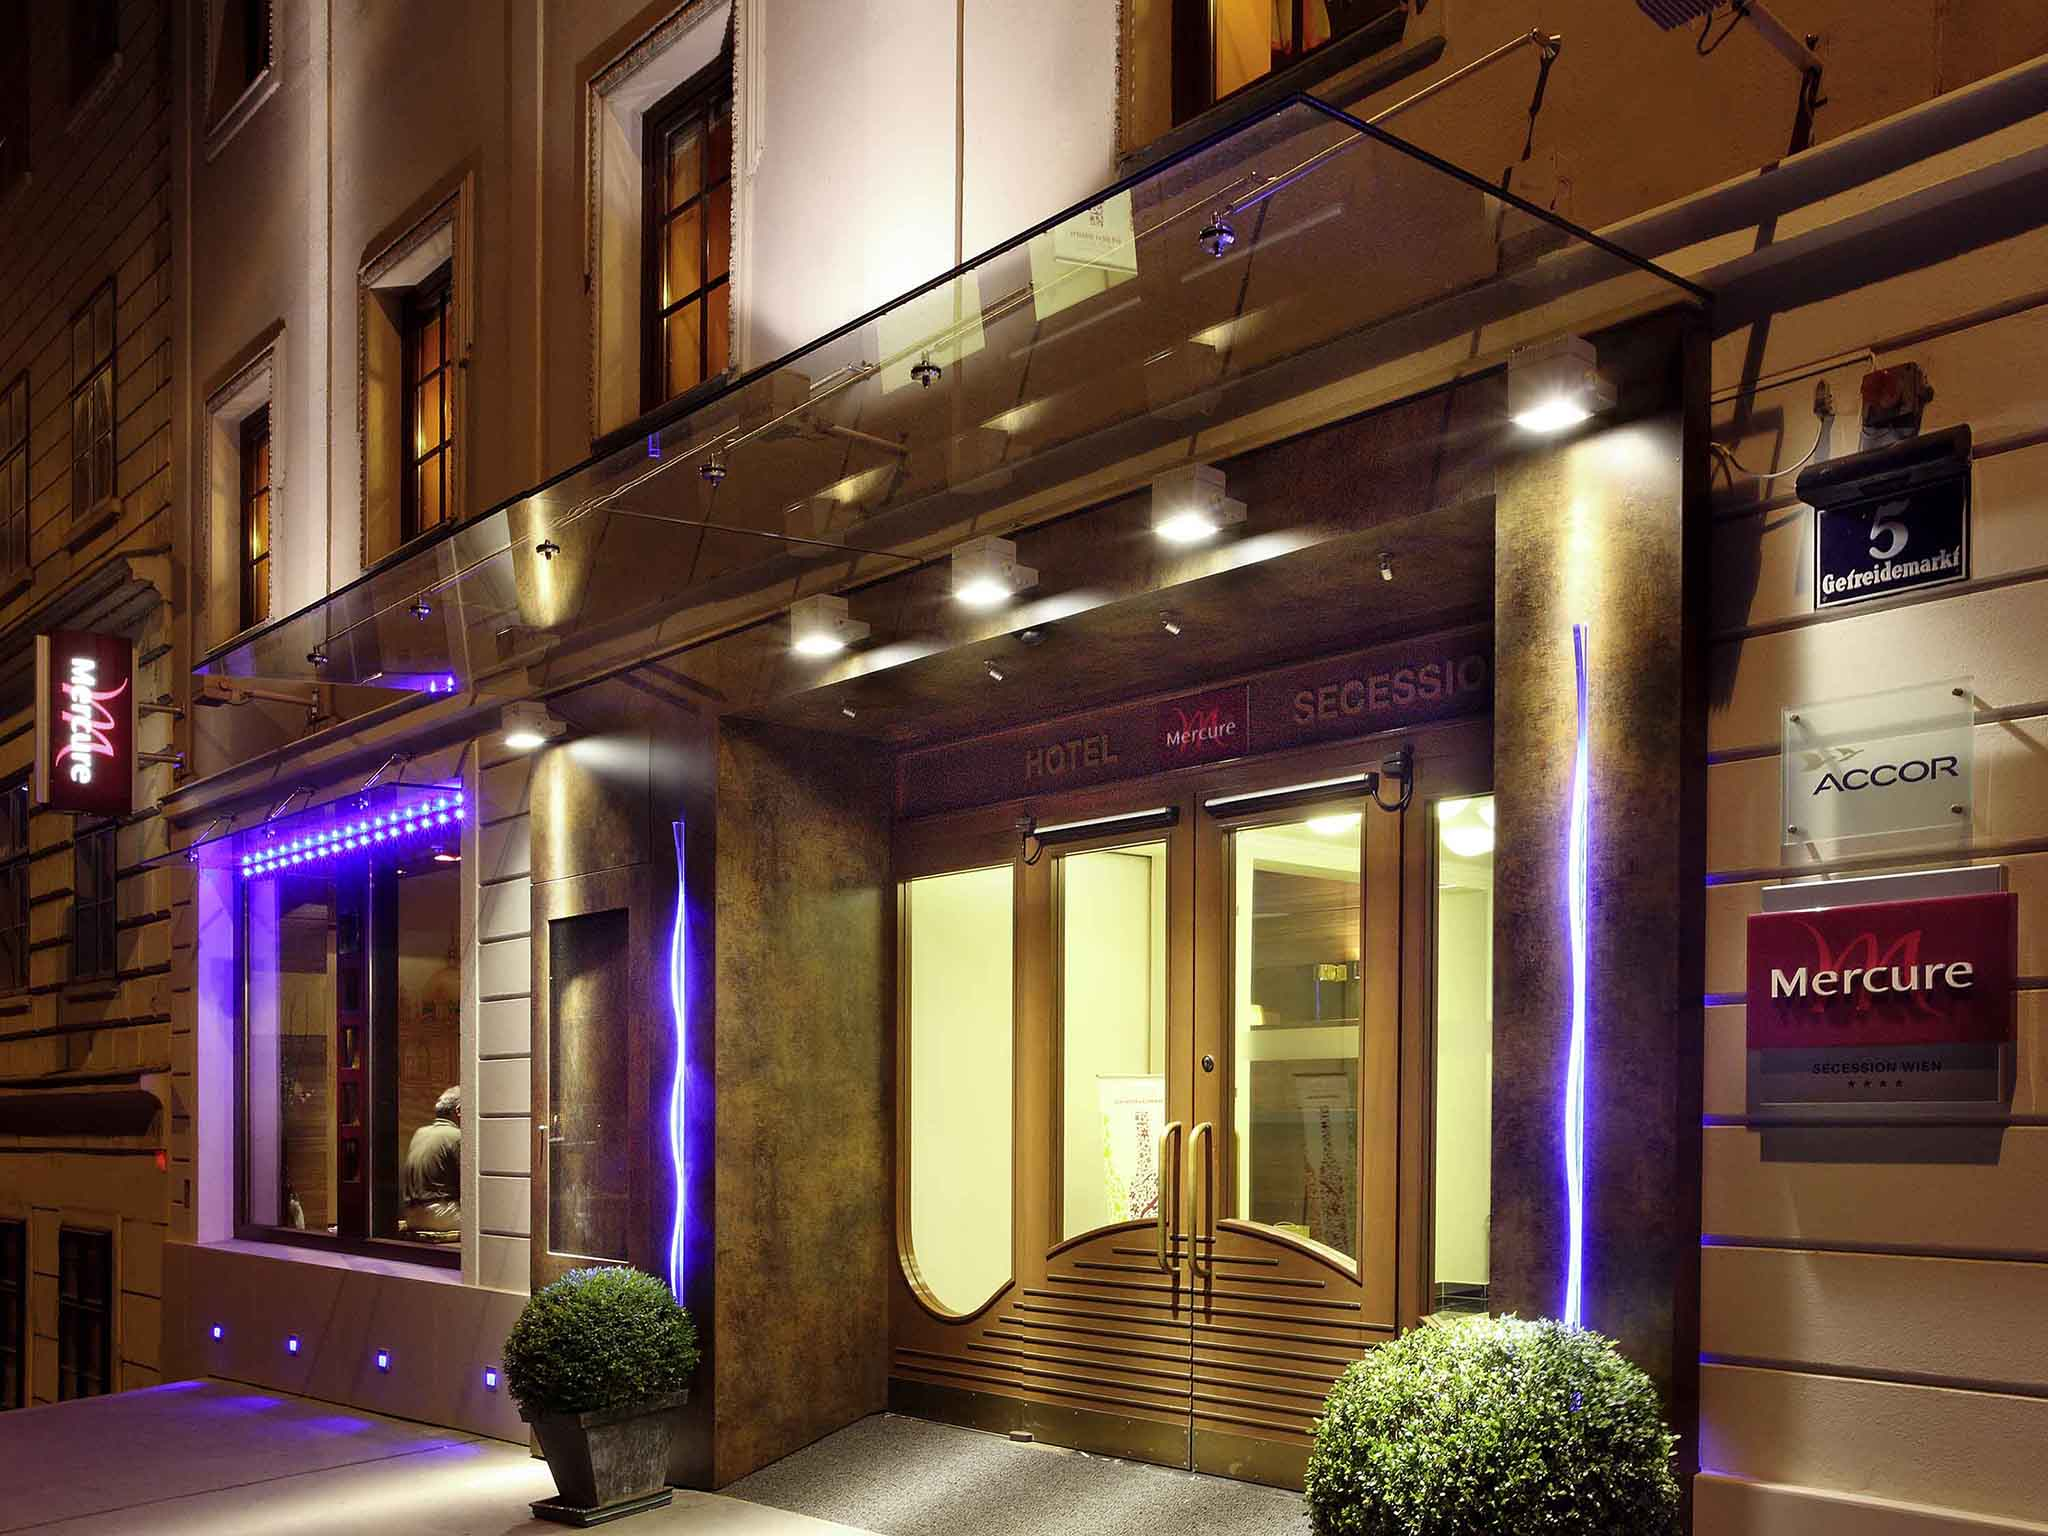 Hôtel - Hotel Mercure Secession Wien